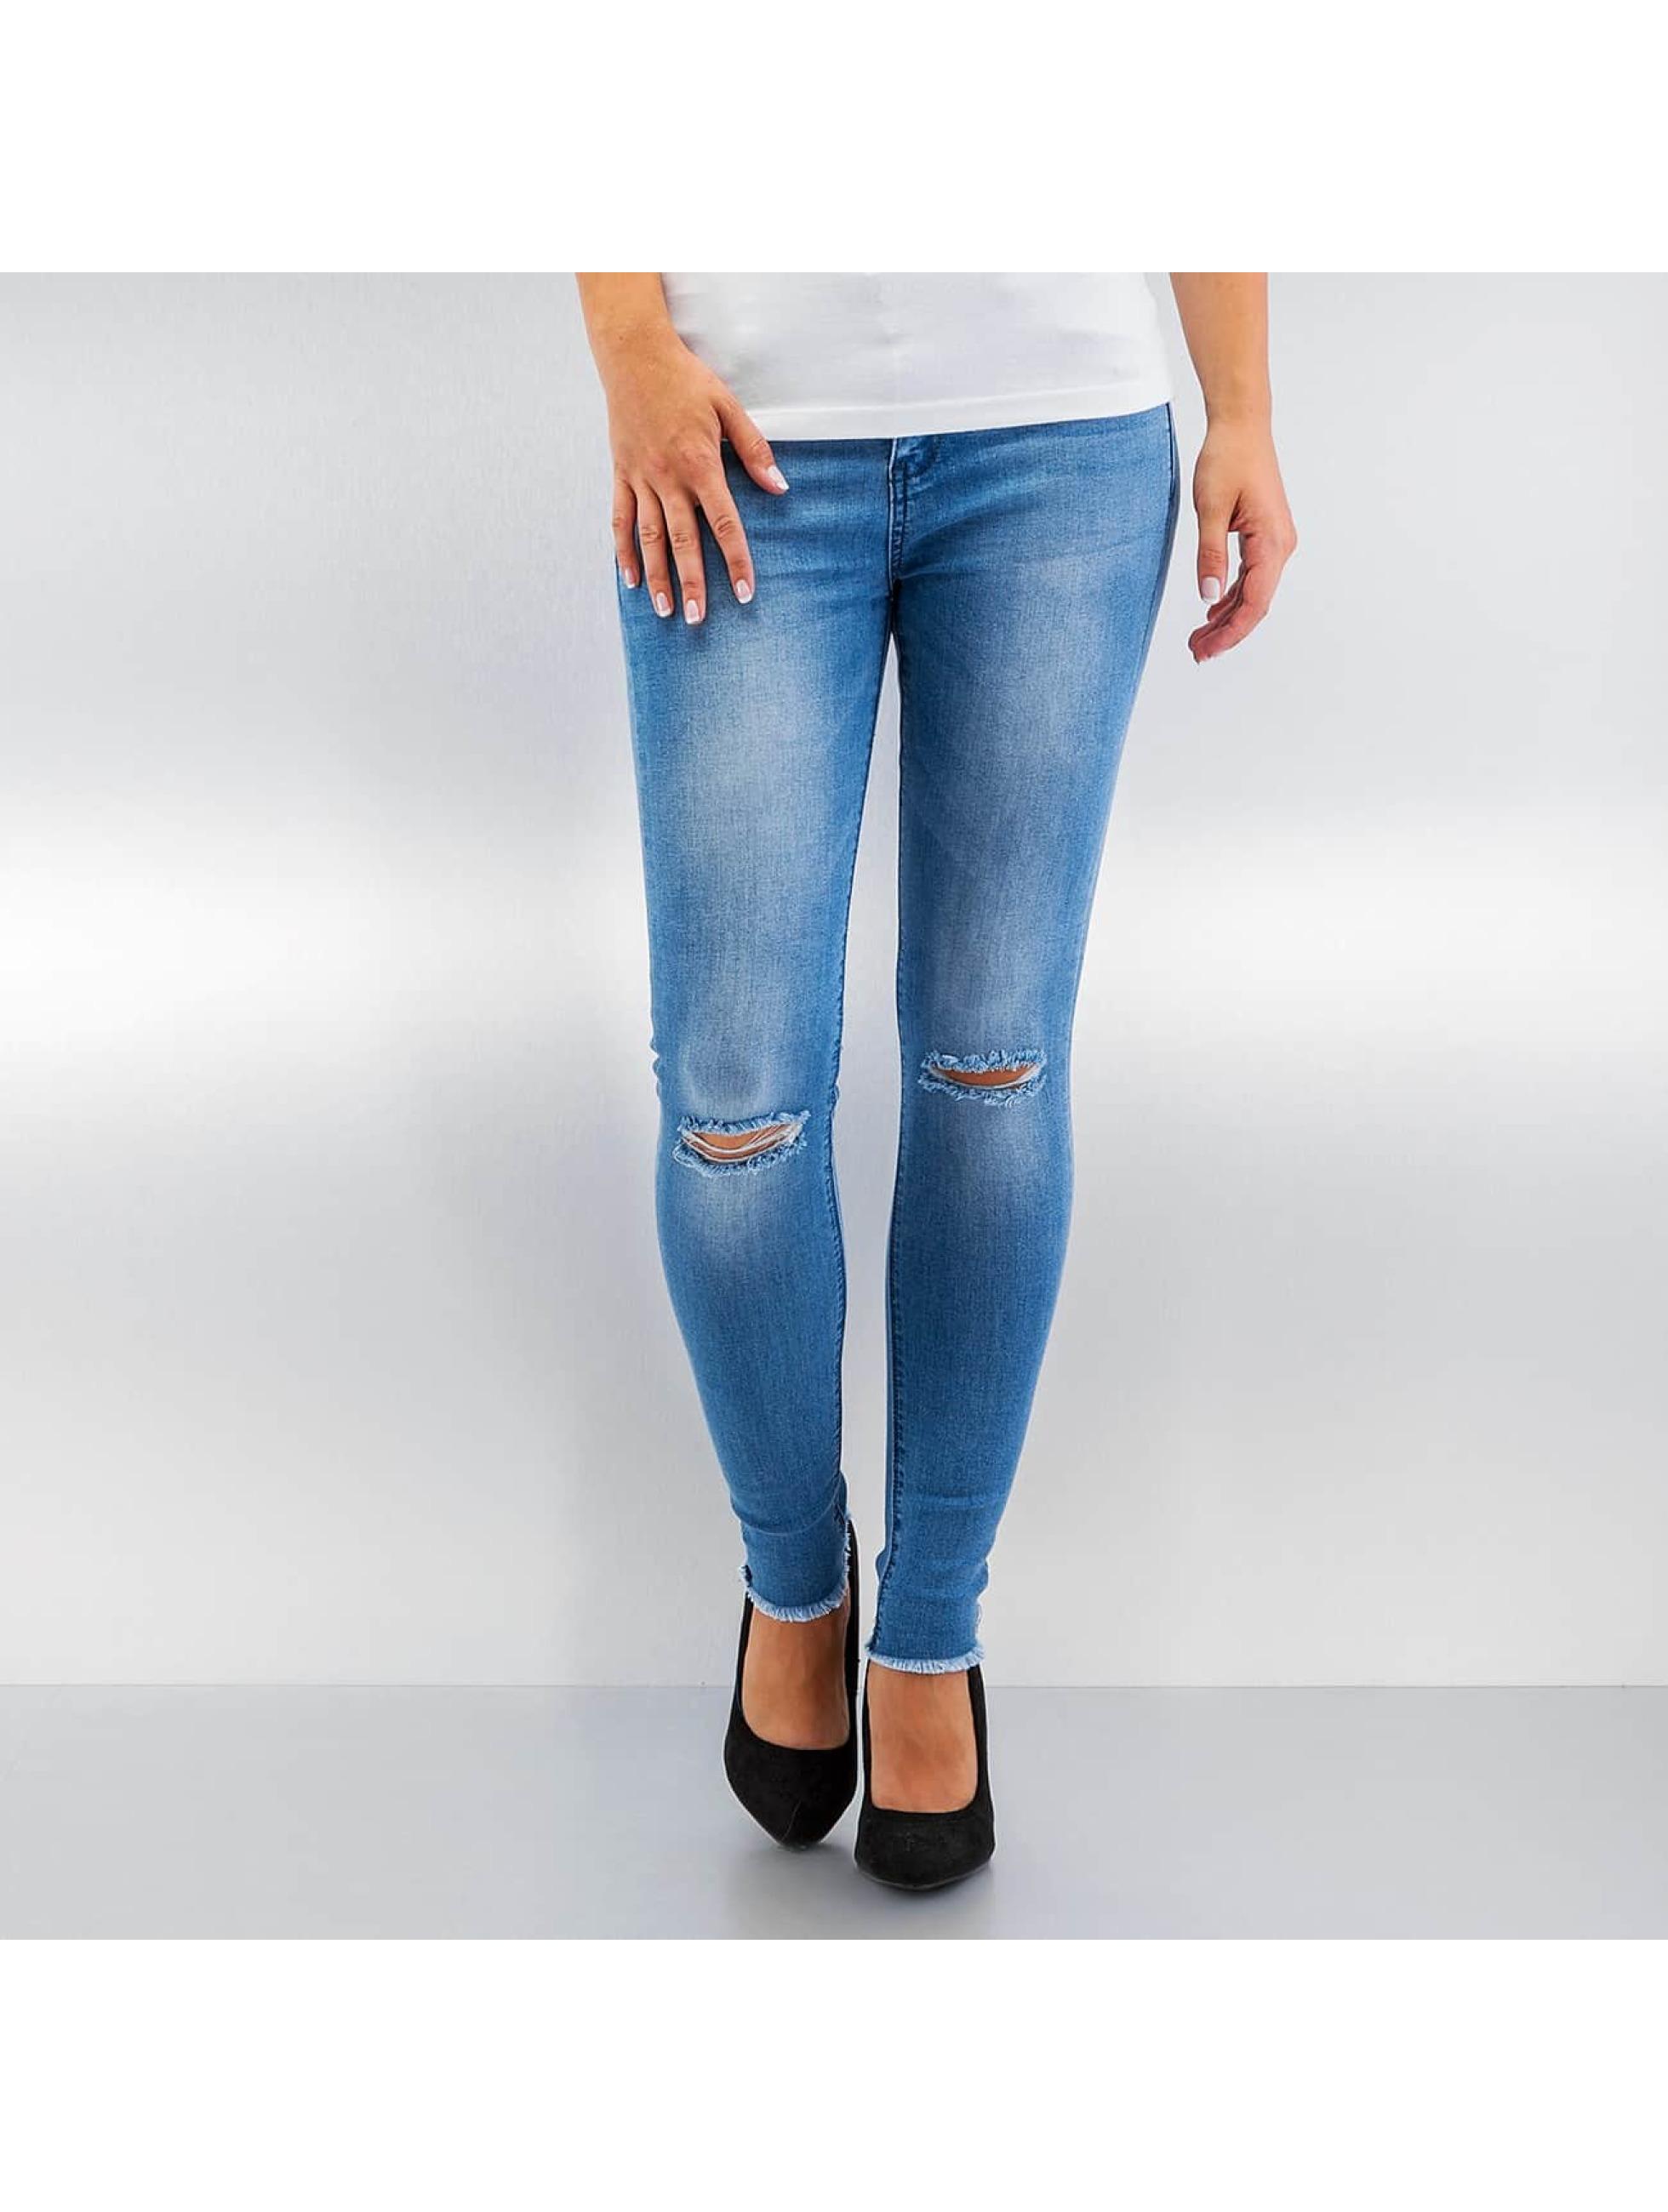 Skinny Jeans Ina in blau